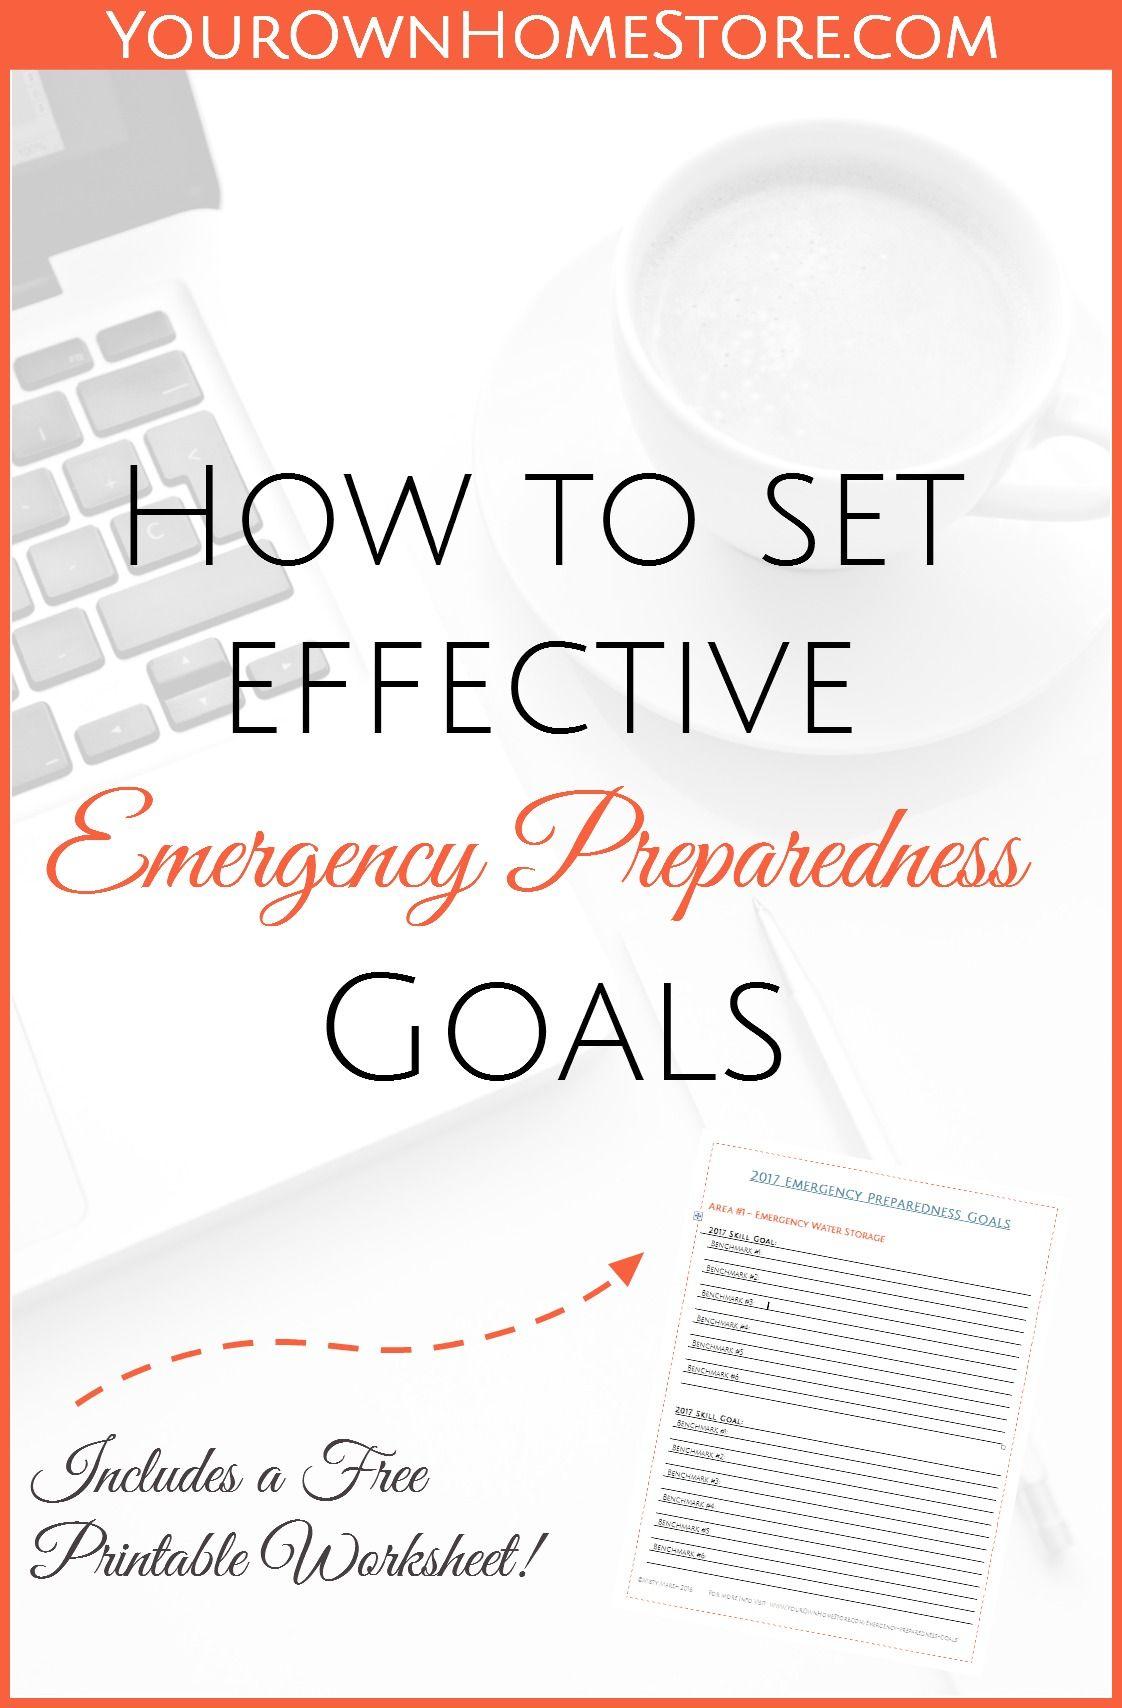 How To Set Effective Emergency Preparedness Goals